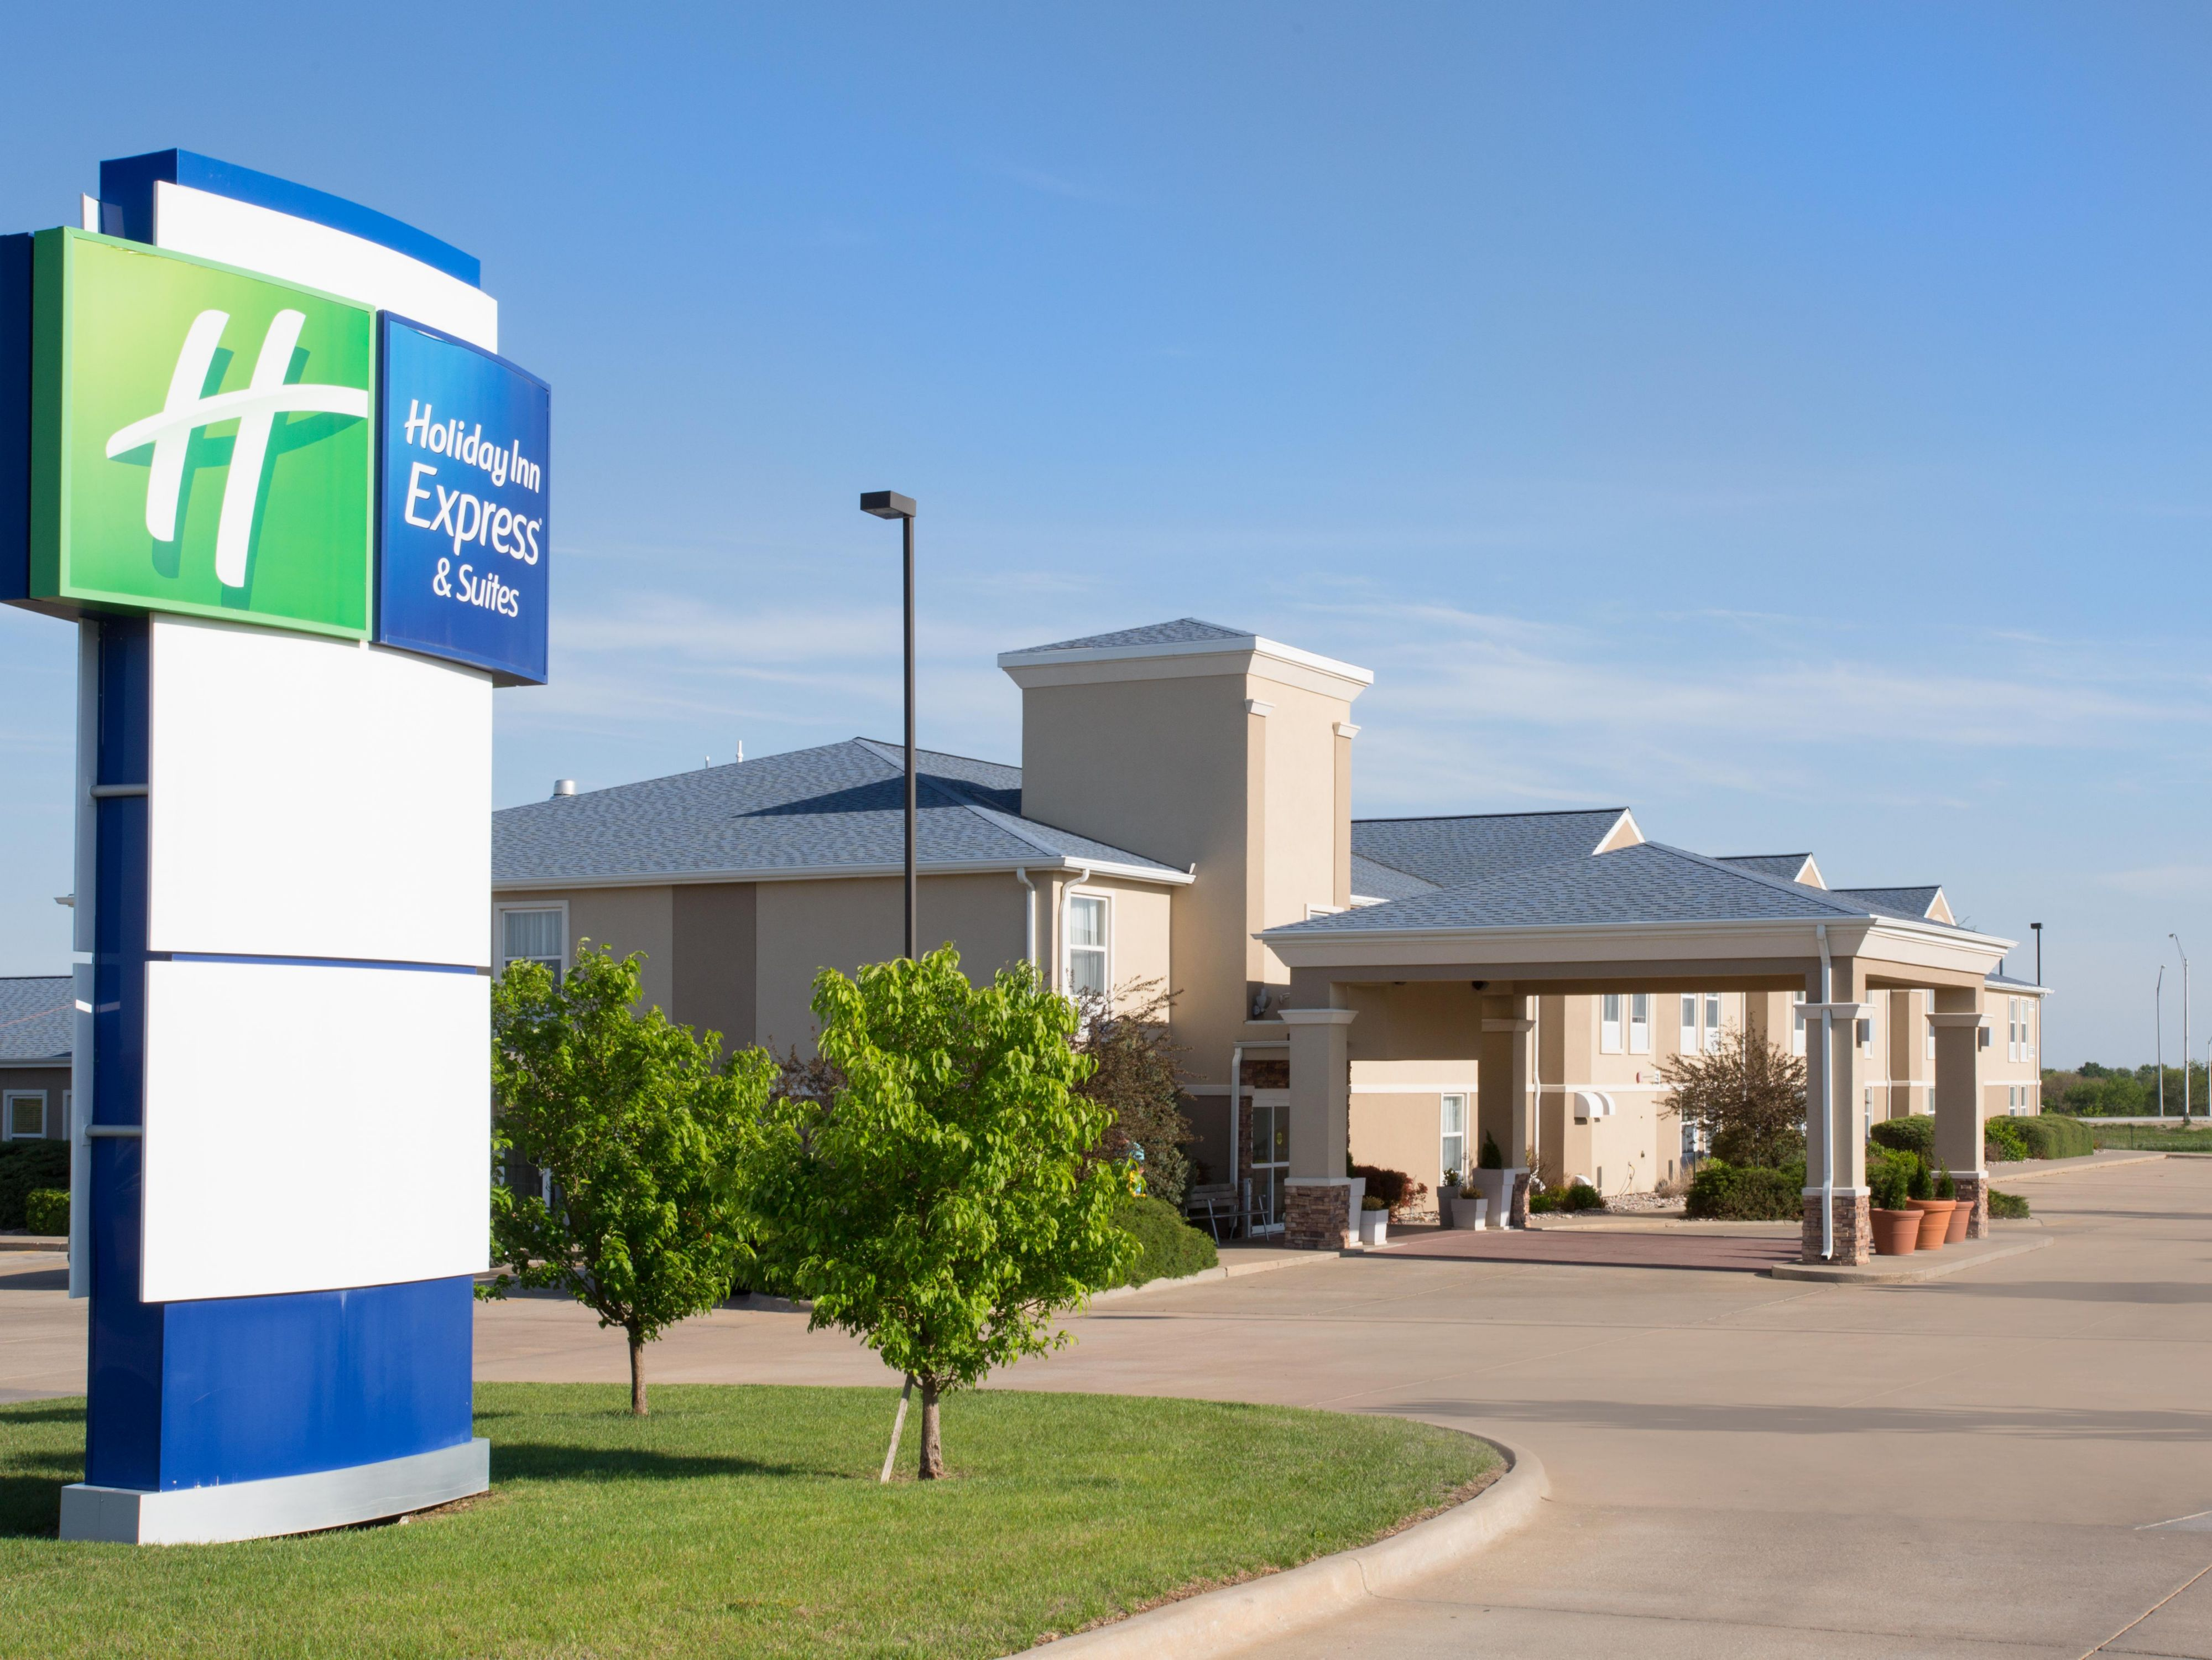 Holiday Inn Express Suites Abilene